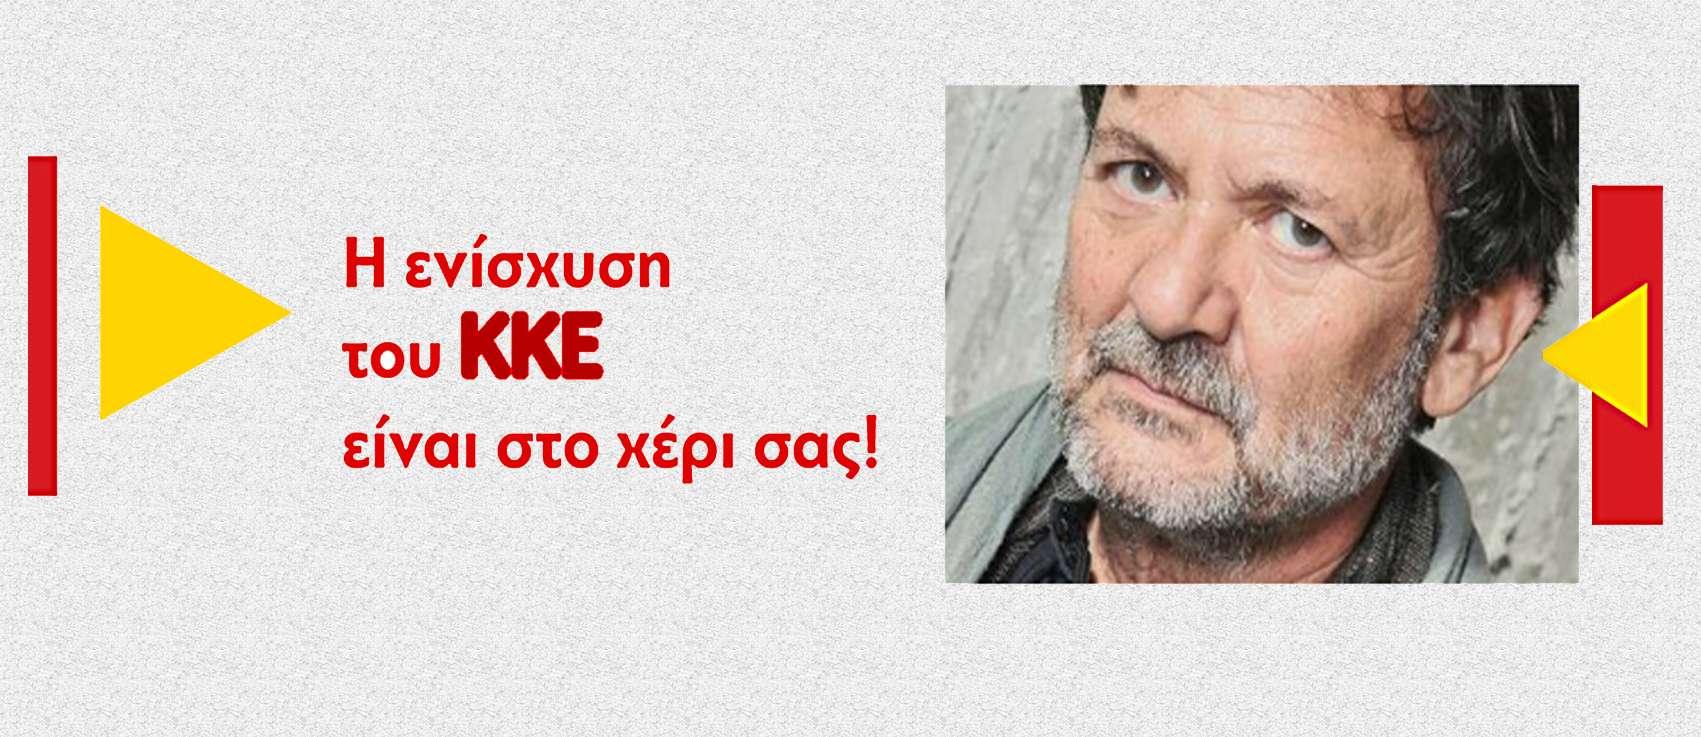 header Γιάννης Καλατζόπουλος 🚩Με το ΚΚΕ για την επόμενη μέρα